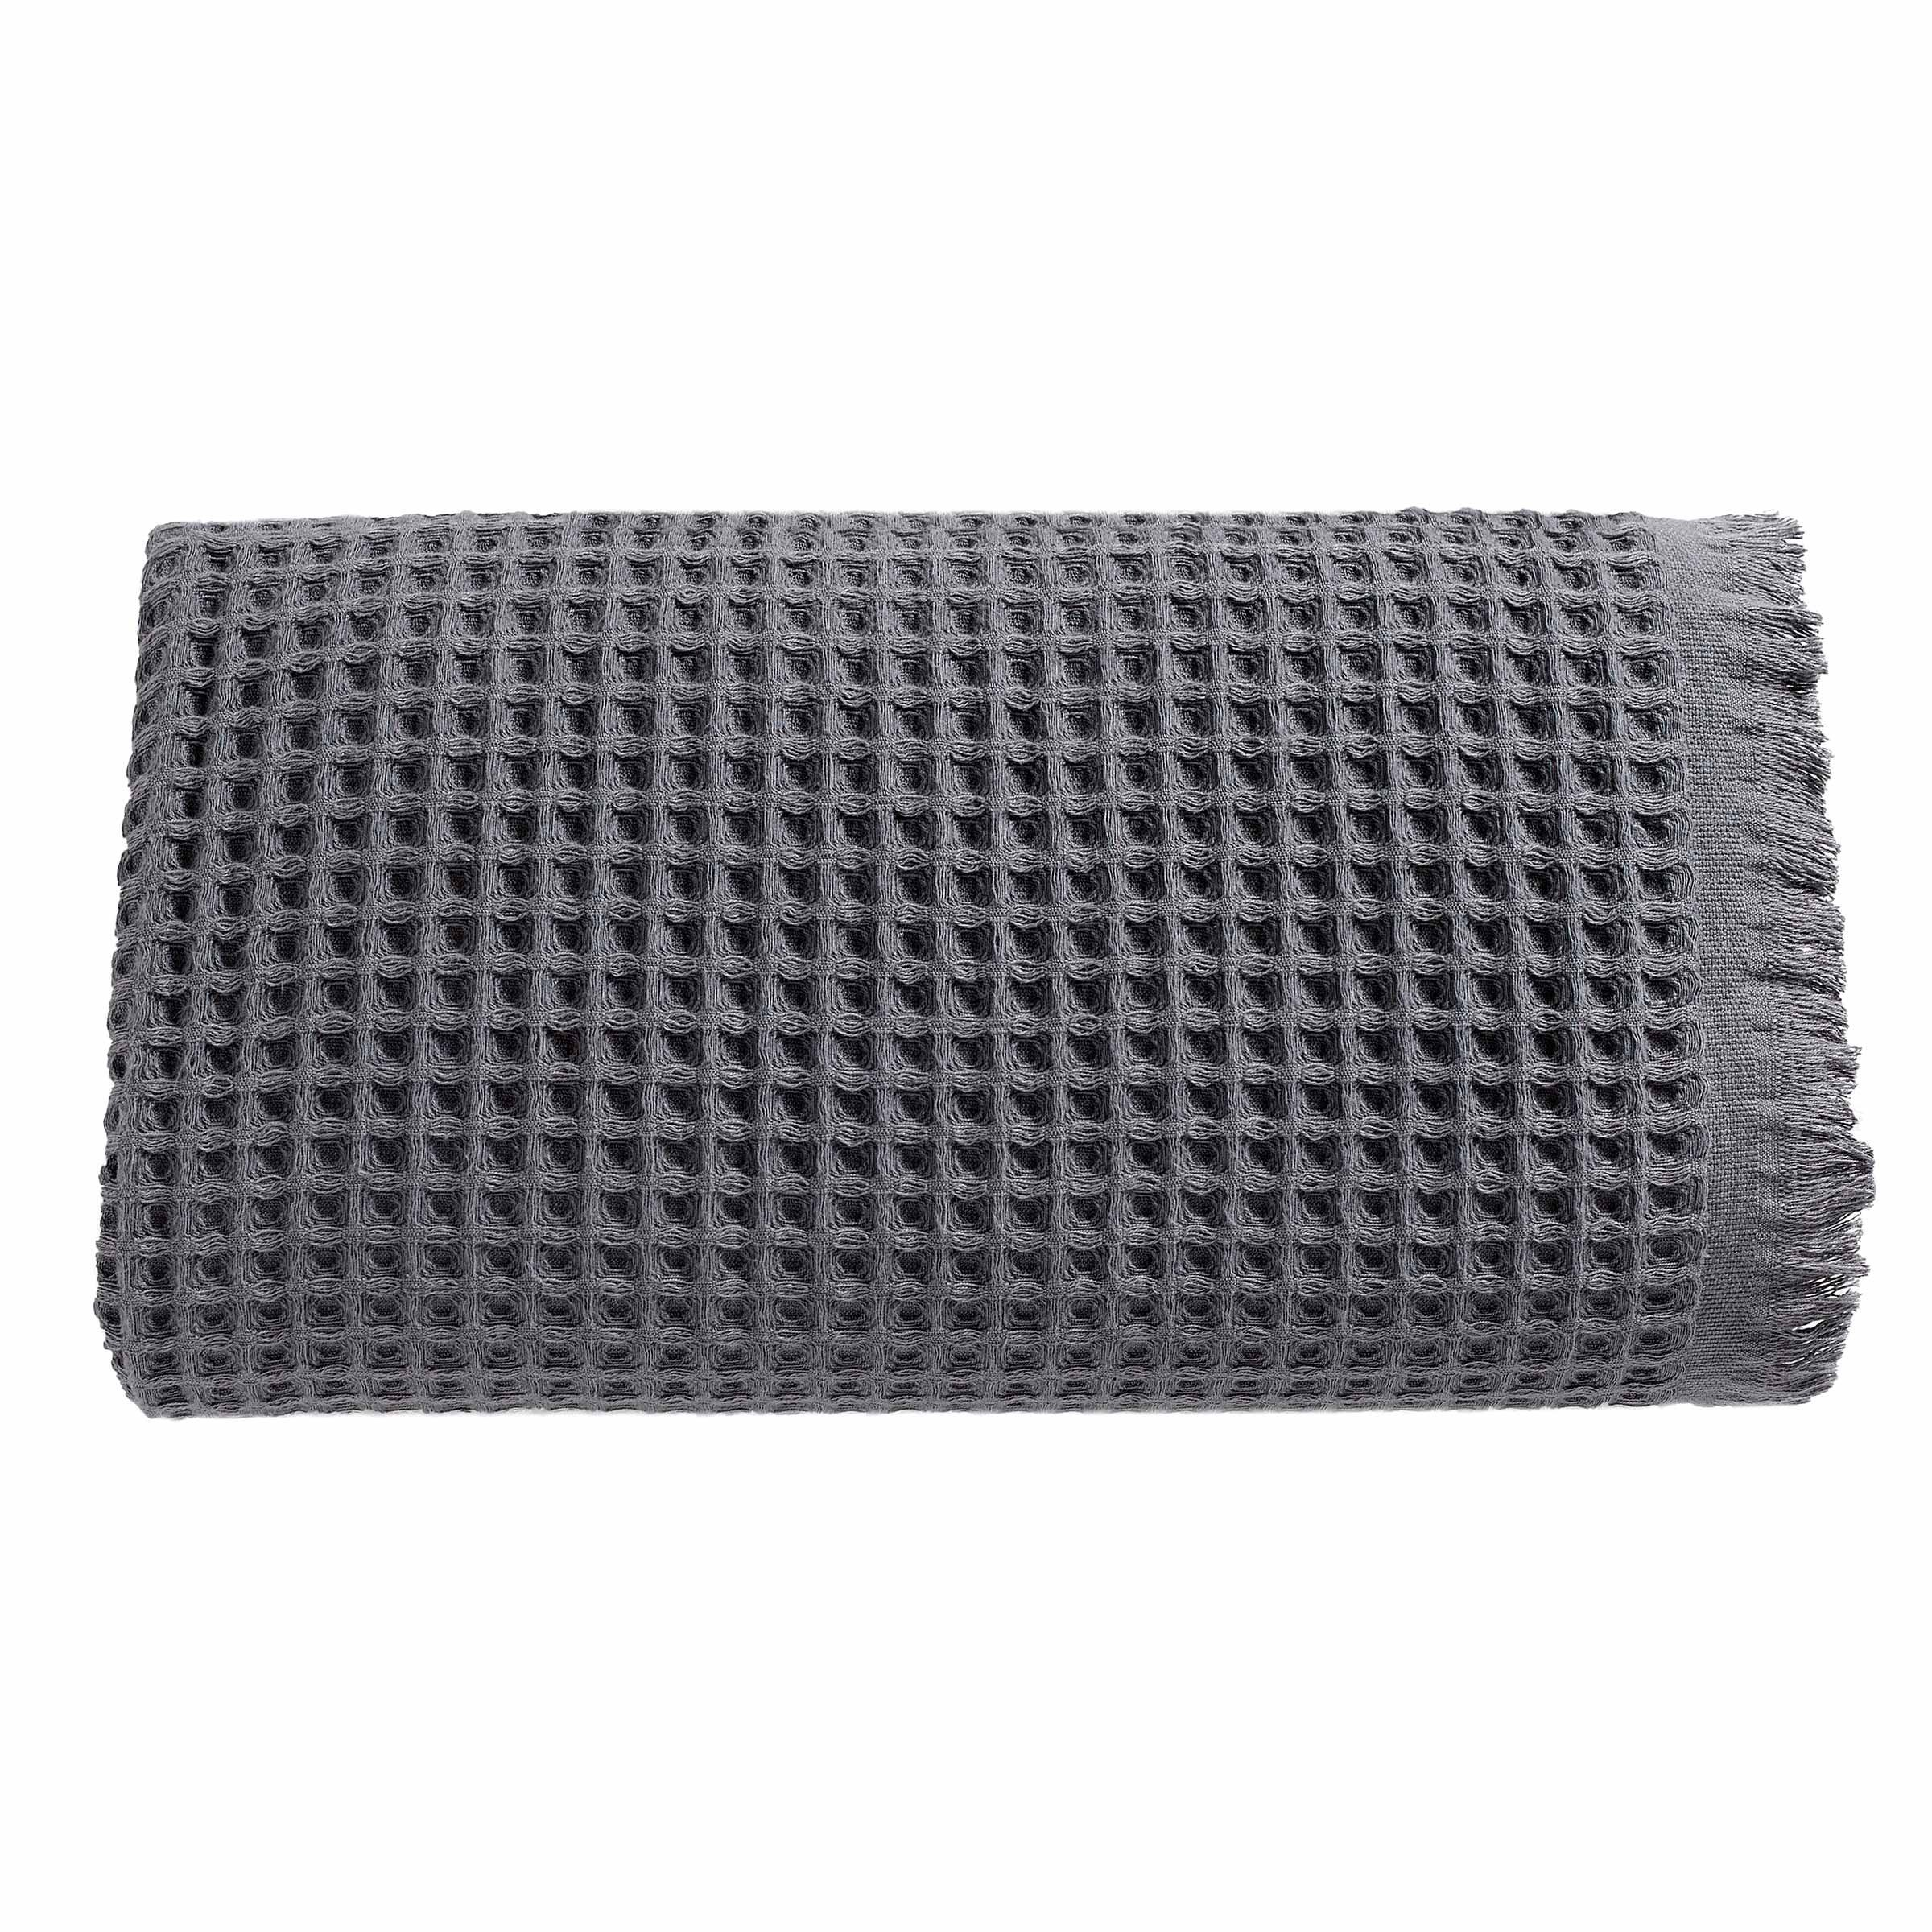 Arvec Turkish Waffle Weave Bath Sheet Towel, Bamboo & Turkish Cotton Blend, Ultra Soft Turkish Bath Towel 35'' x 70'' (Grey)